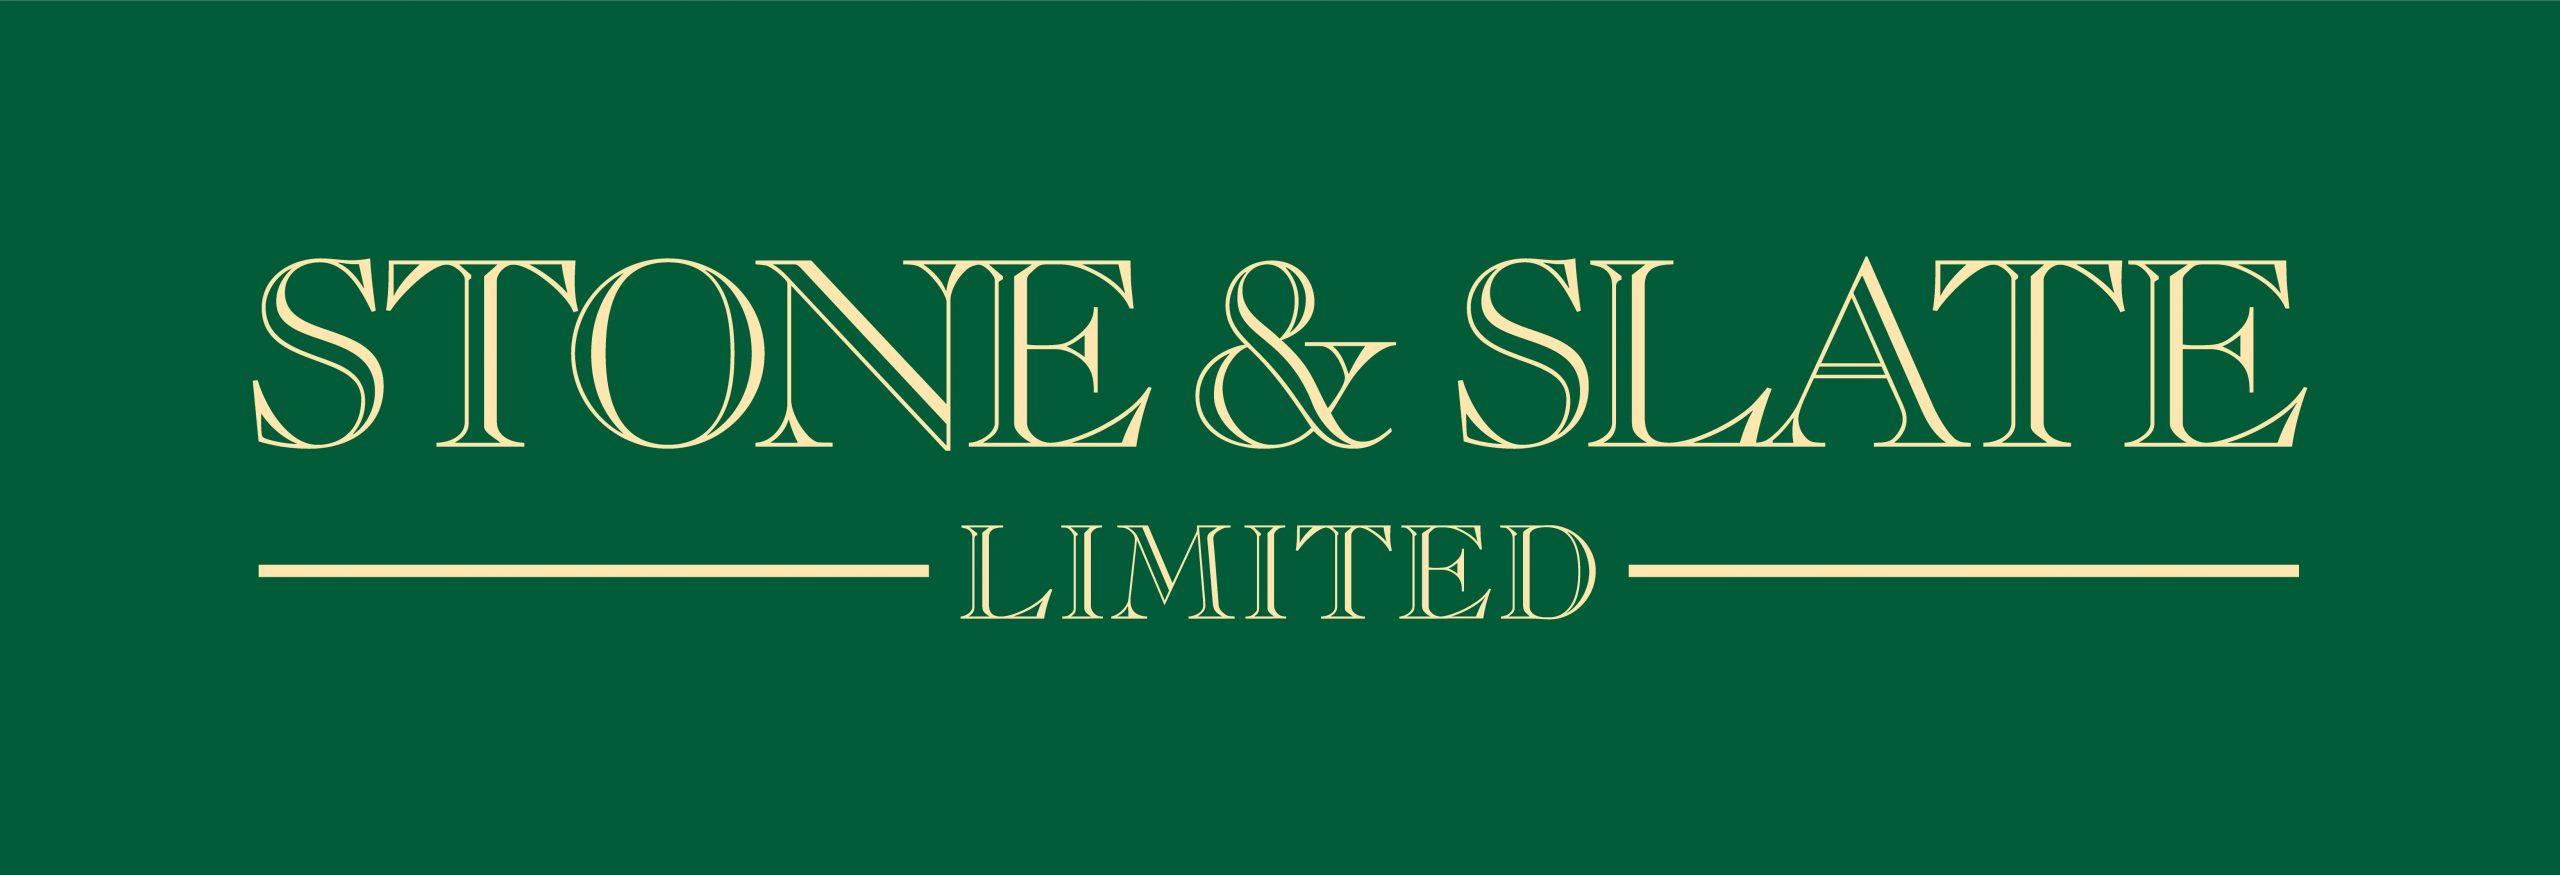 Stone & Slate Ltd